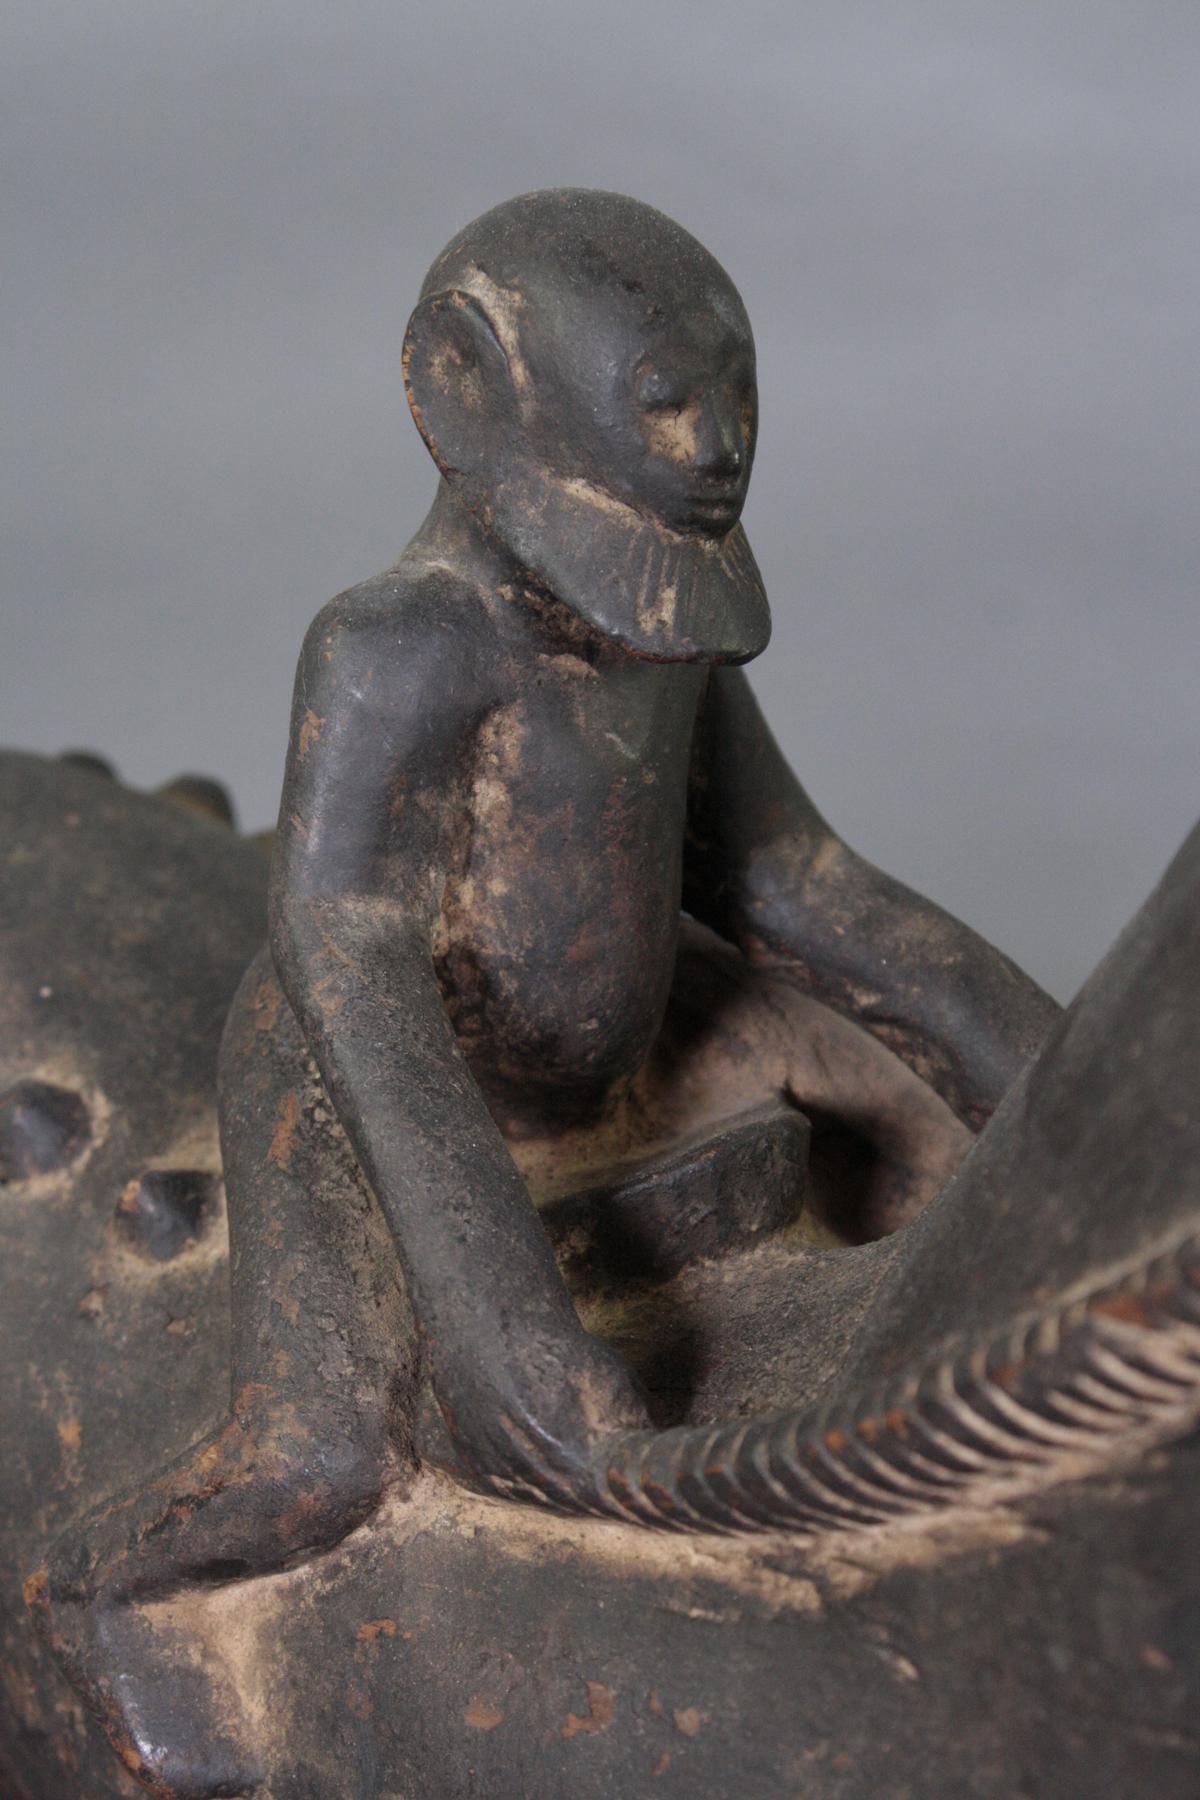 Geschnitzter Tierfigur, wohl Dogon, Mali, 1. Hälfe 20. Jh.-3